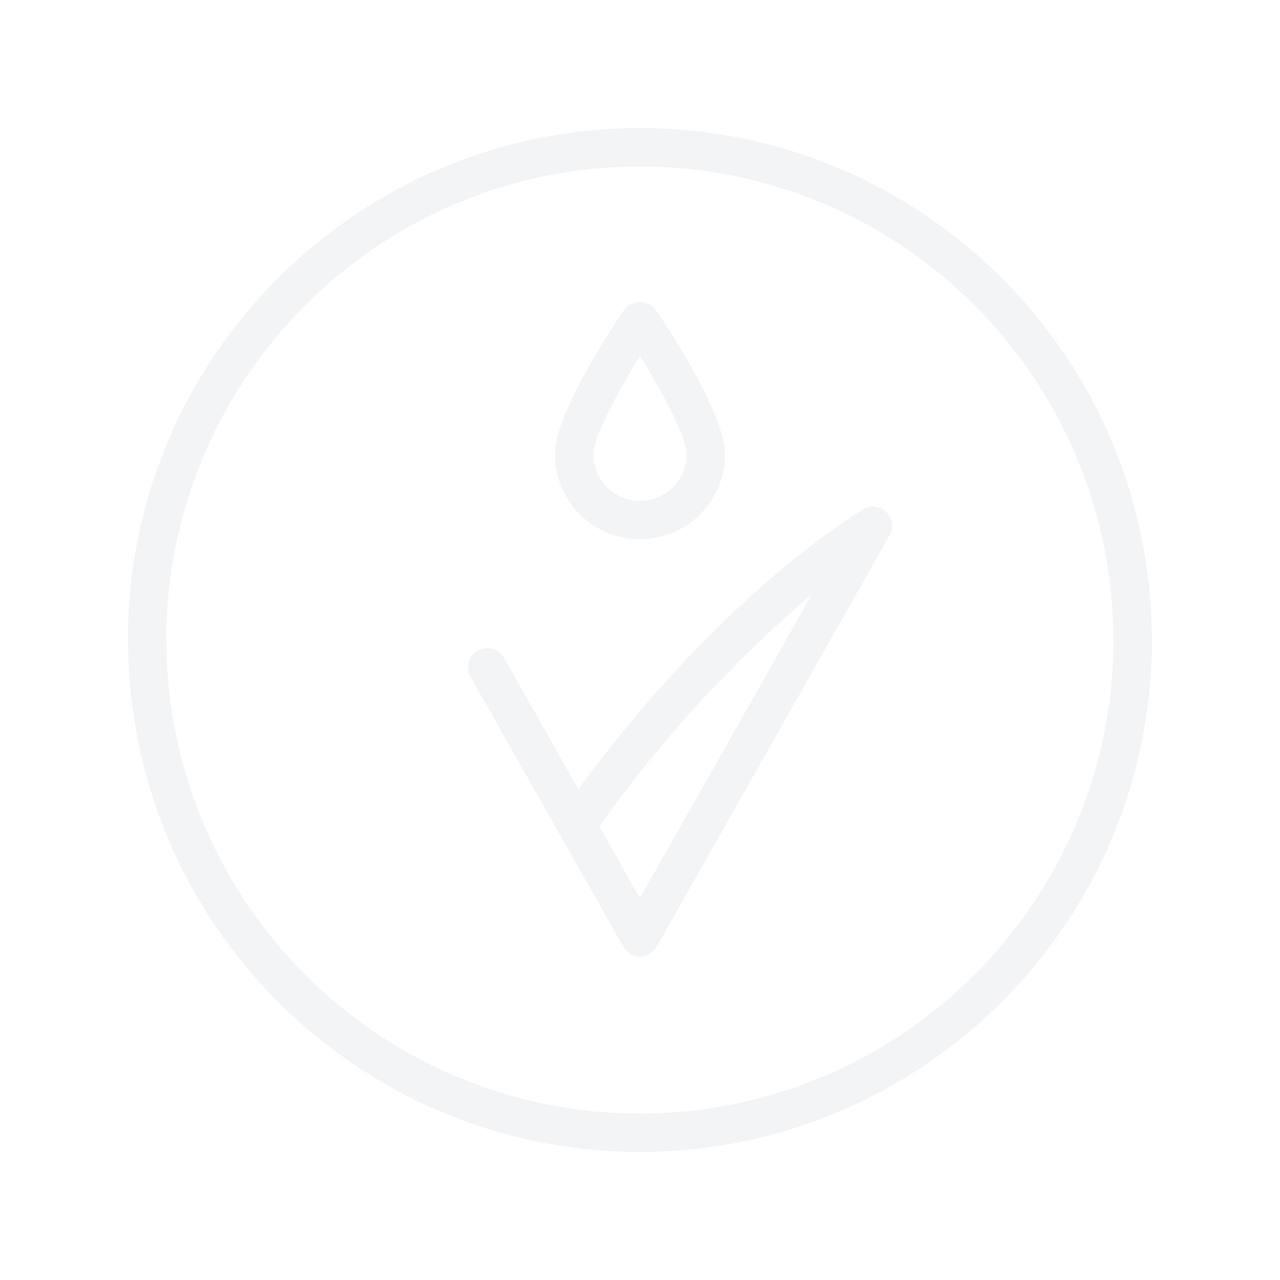 PACIFIC SHAVING All Natural Shaving Cream 101ml